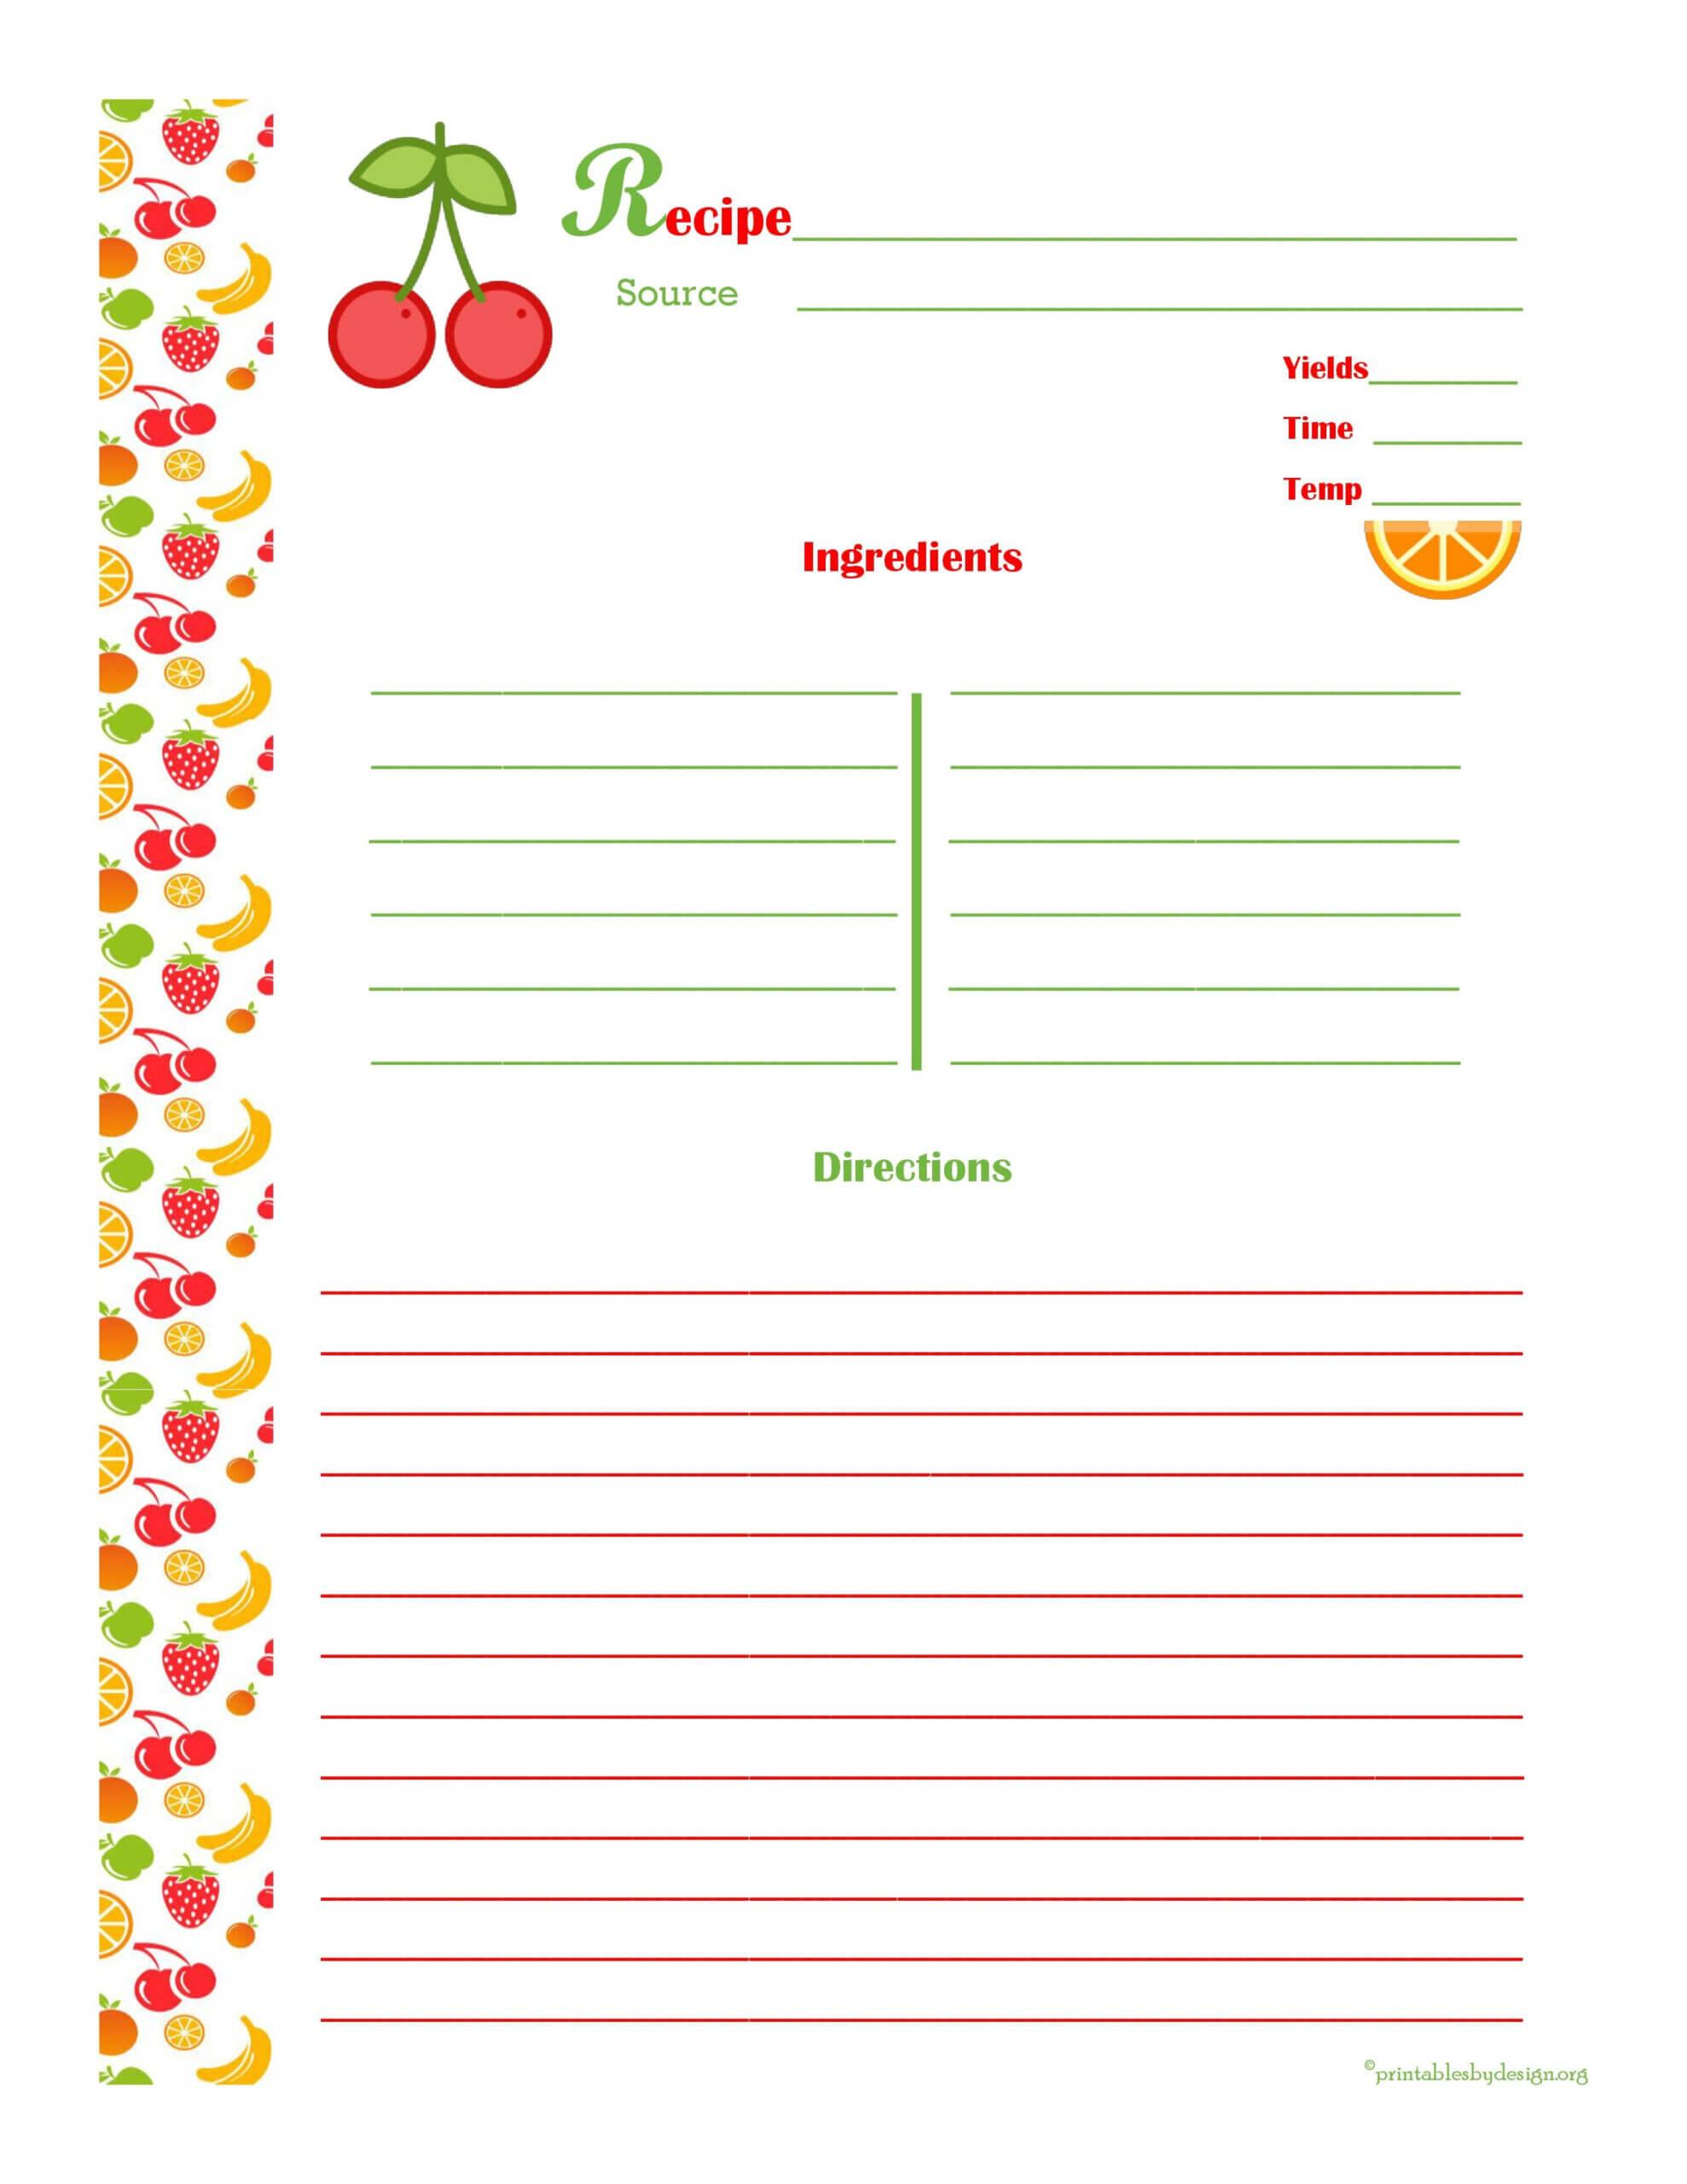 Cherry & Orange Recipe Card - Full Page | Printable Recipe With Regard To Microsoft Word Recipe Card Template